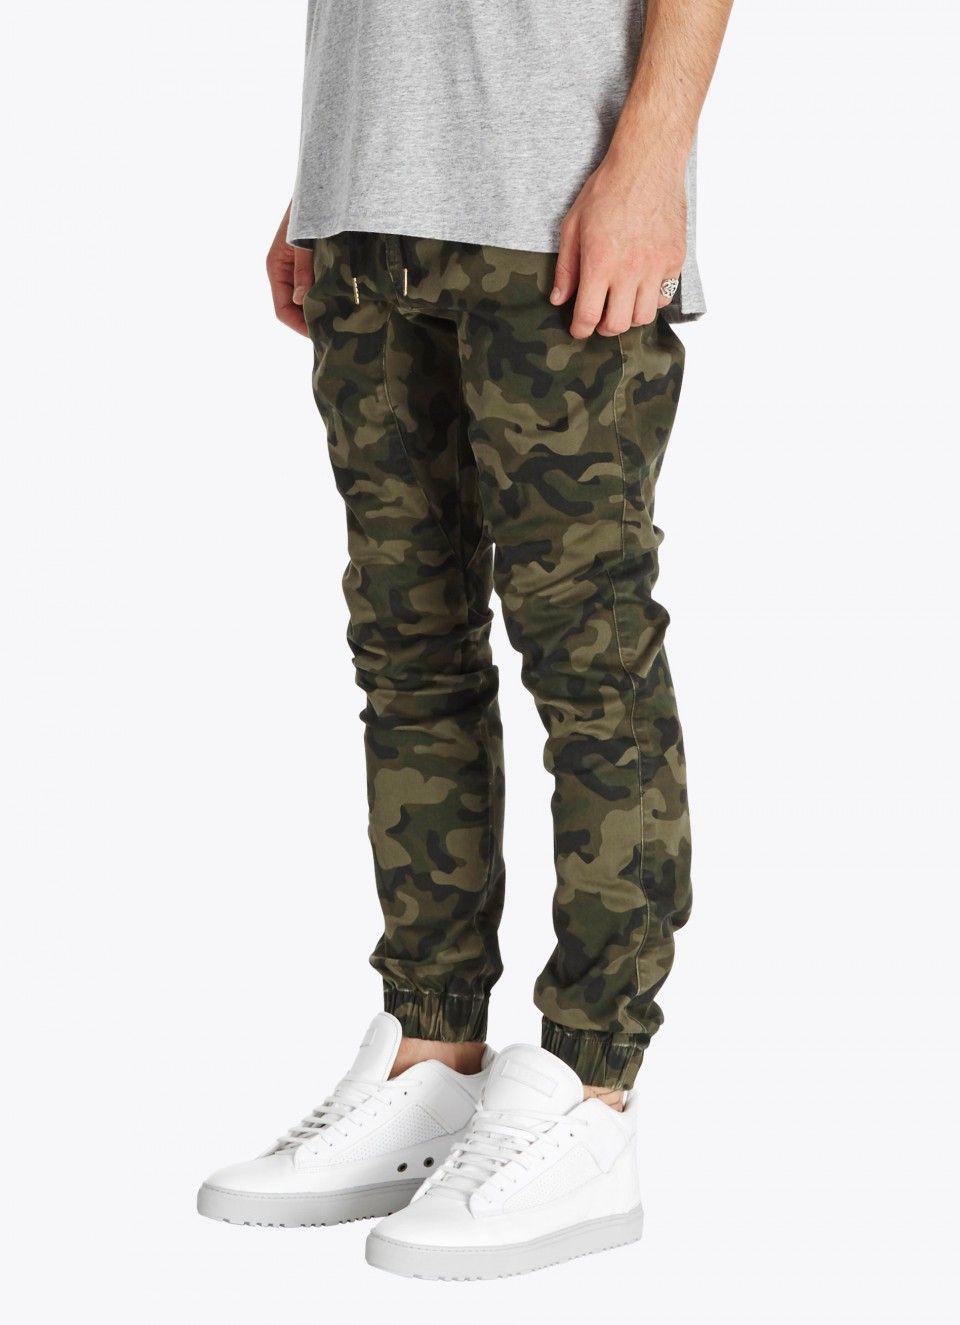 Sureshot jogger dark camo joggers zanerobe jogger pants